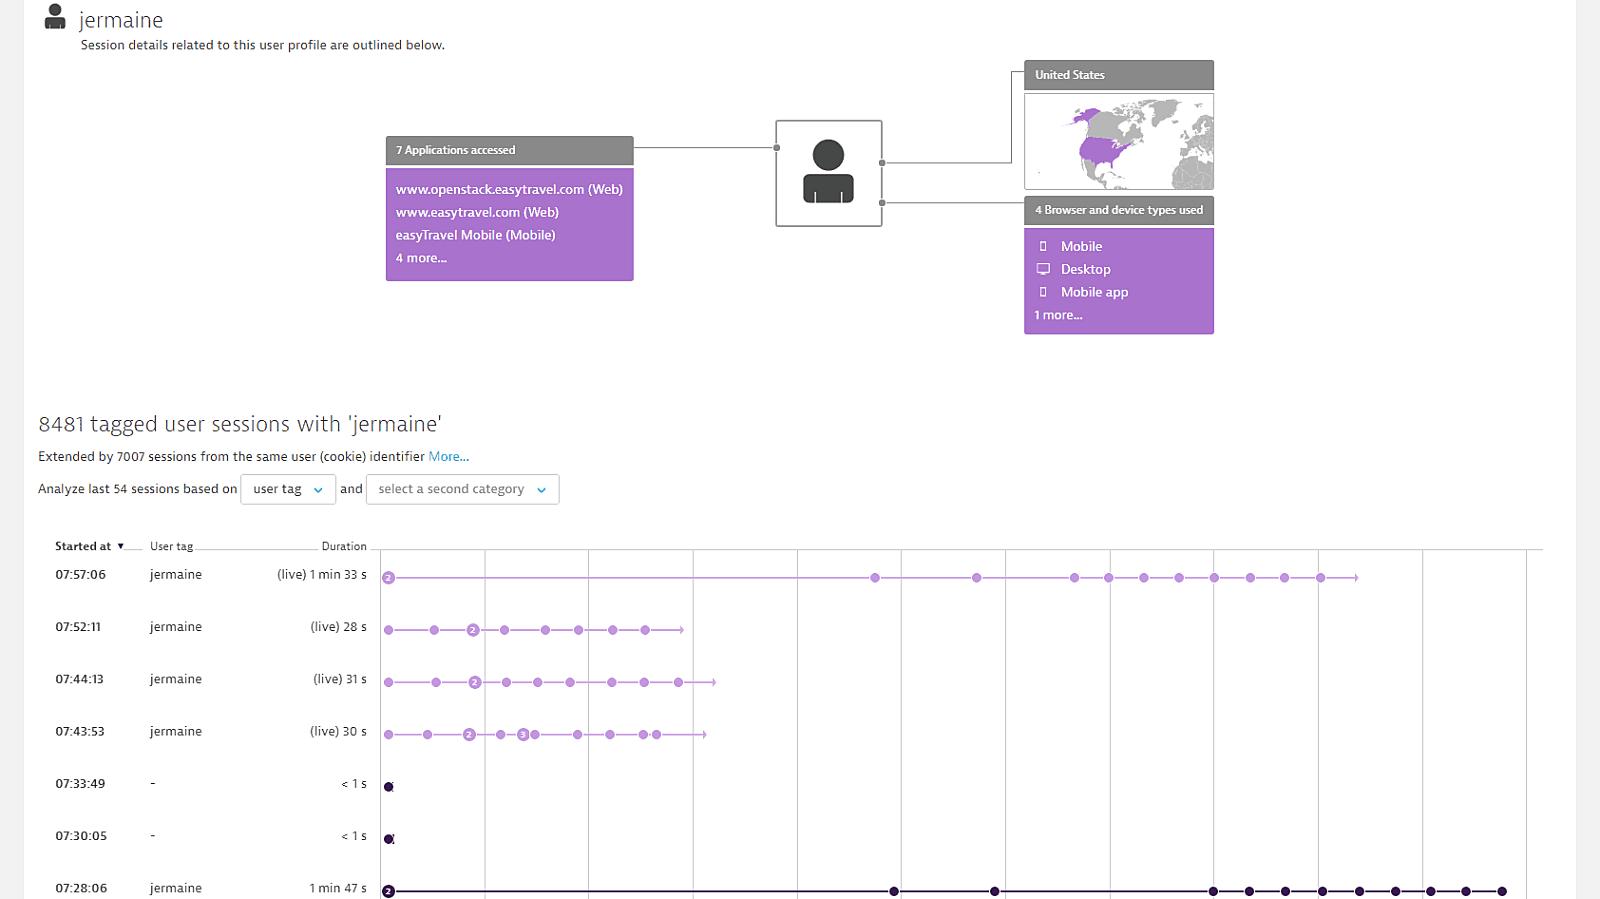 Dynatrace user session details jermaine